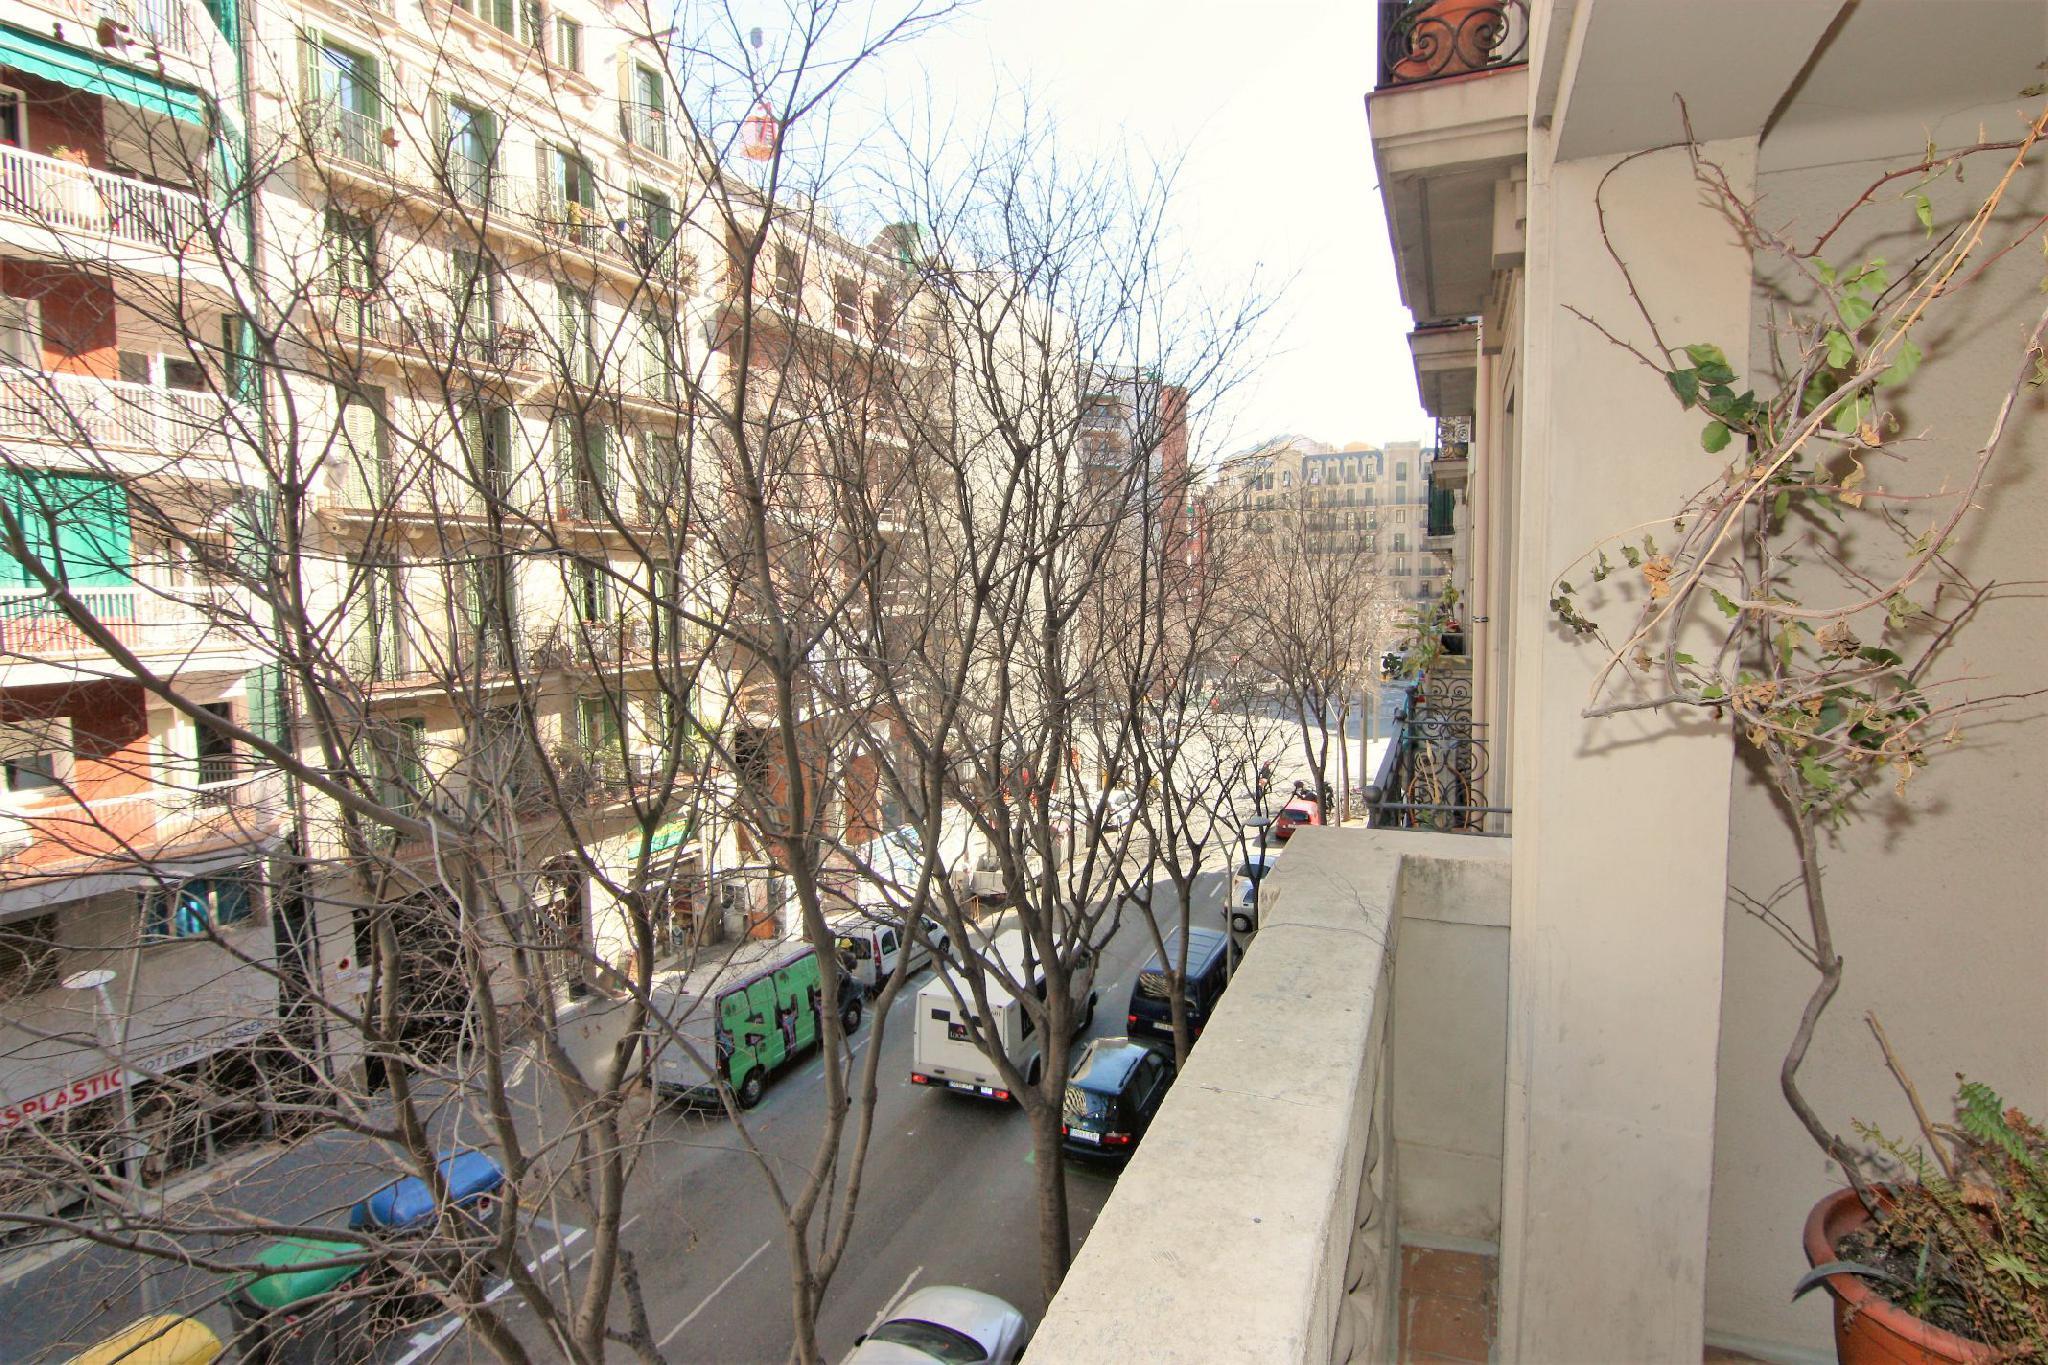 225802 - Avenida Paral.lel / Calle Tamarit